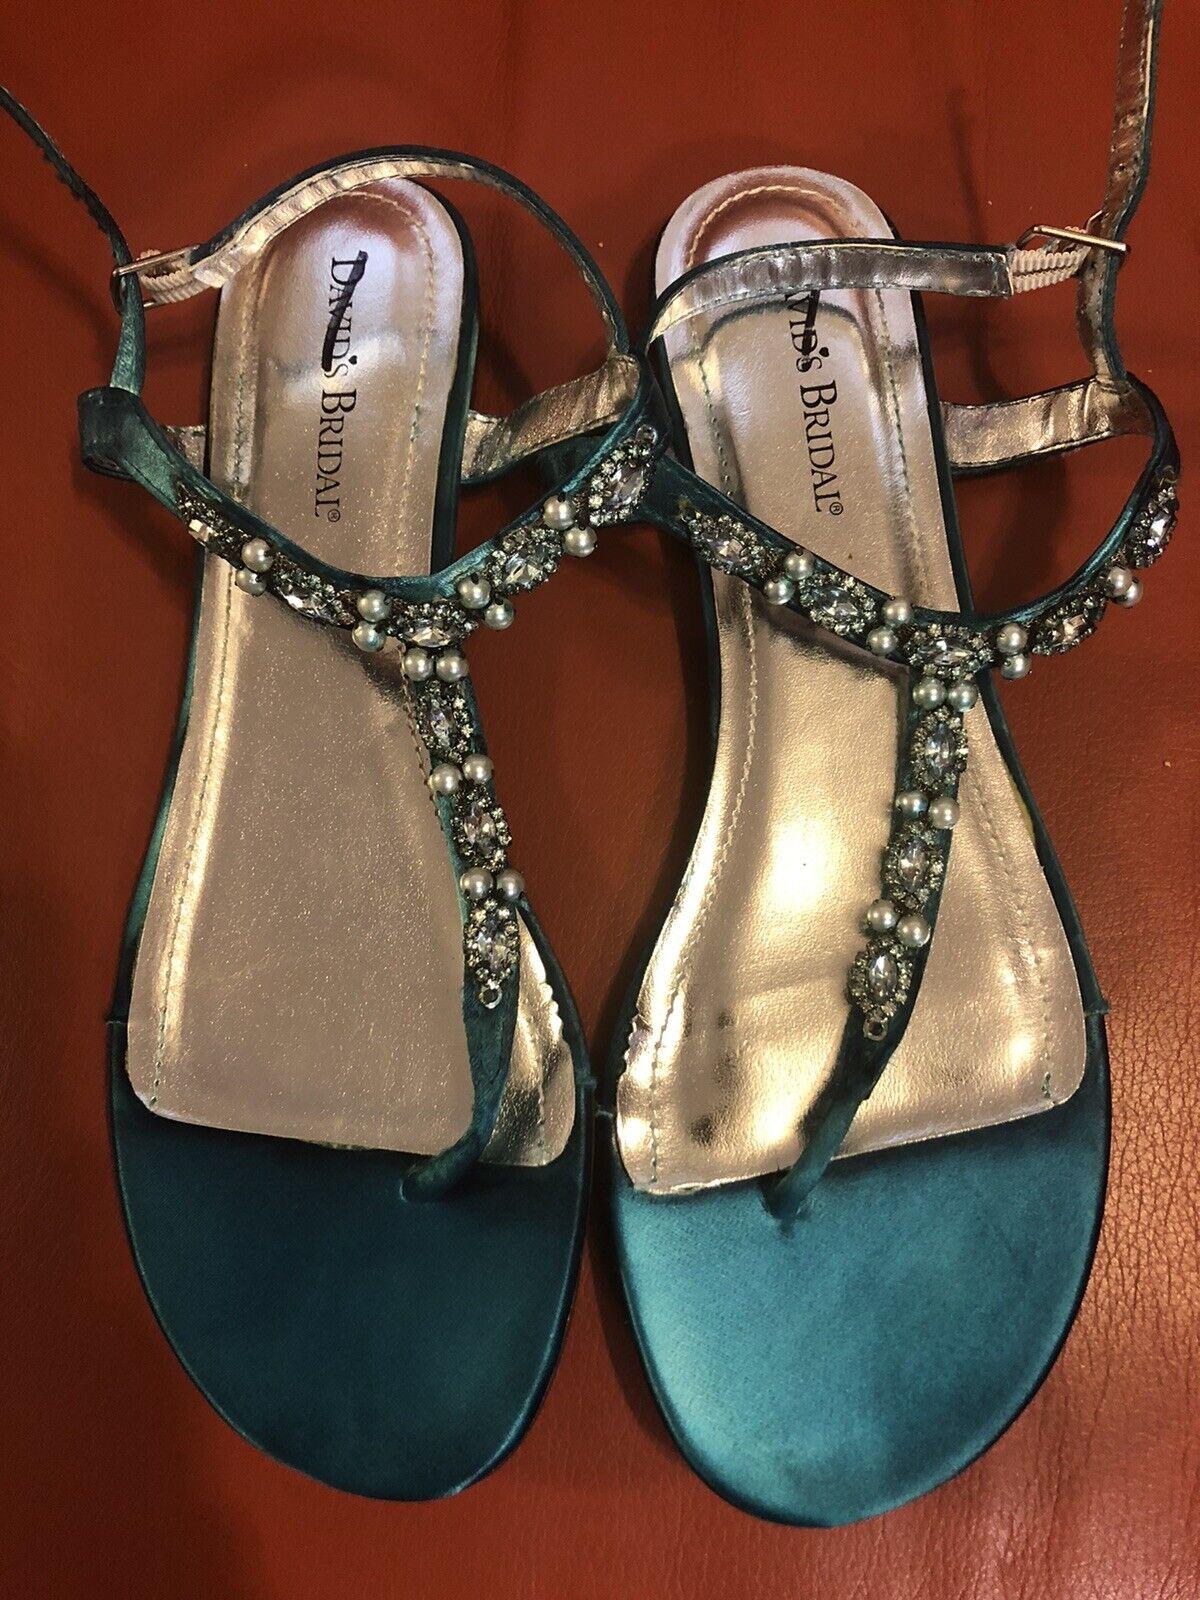 David's Bridal Shoes Pearl Crystal Stella T Strap Jeweled Sandals 8